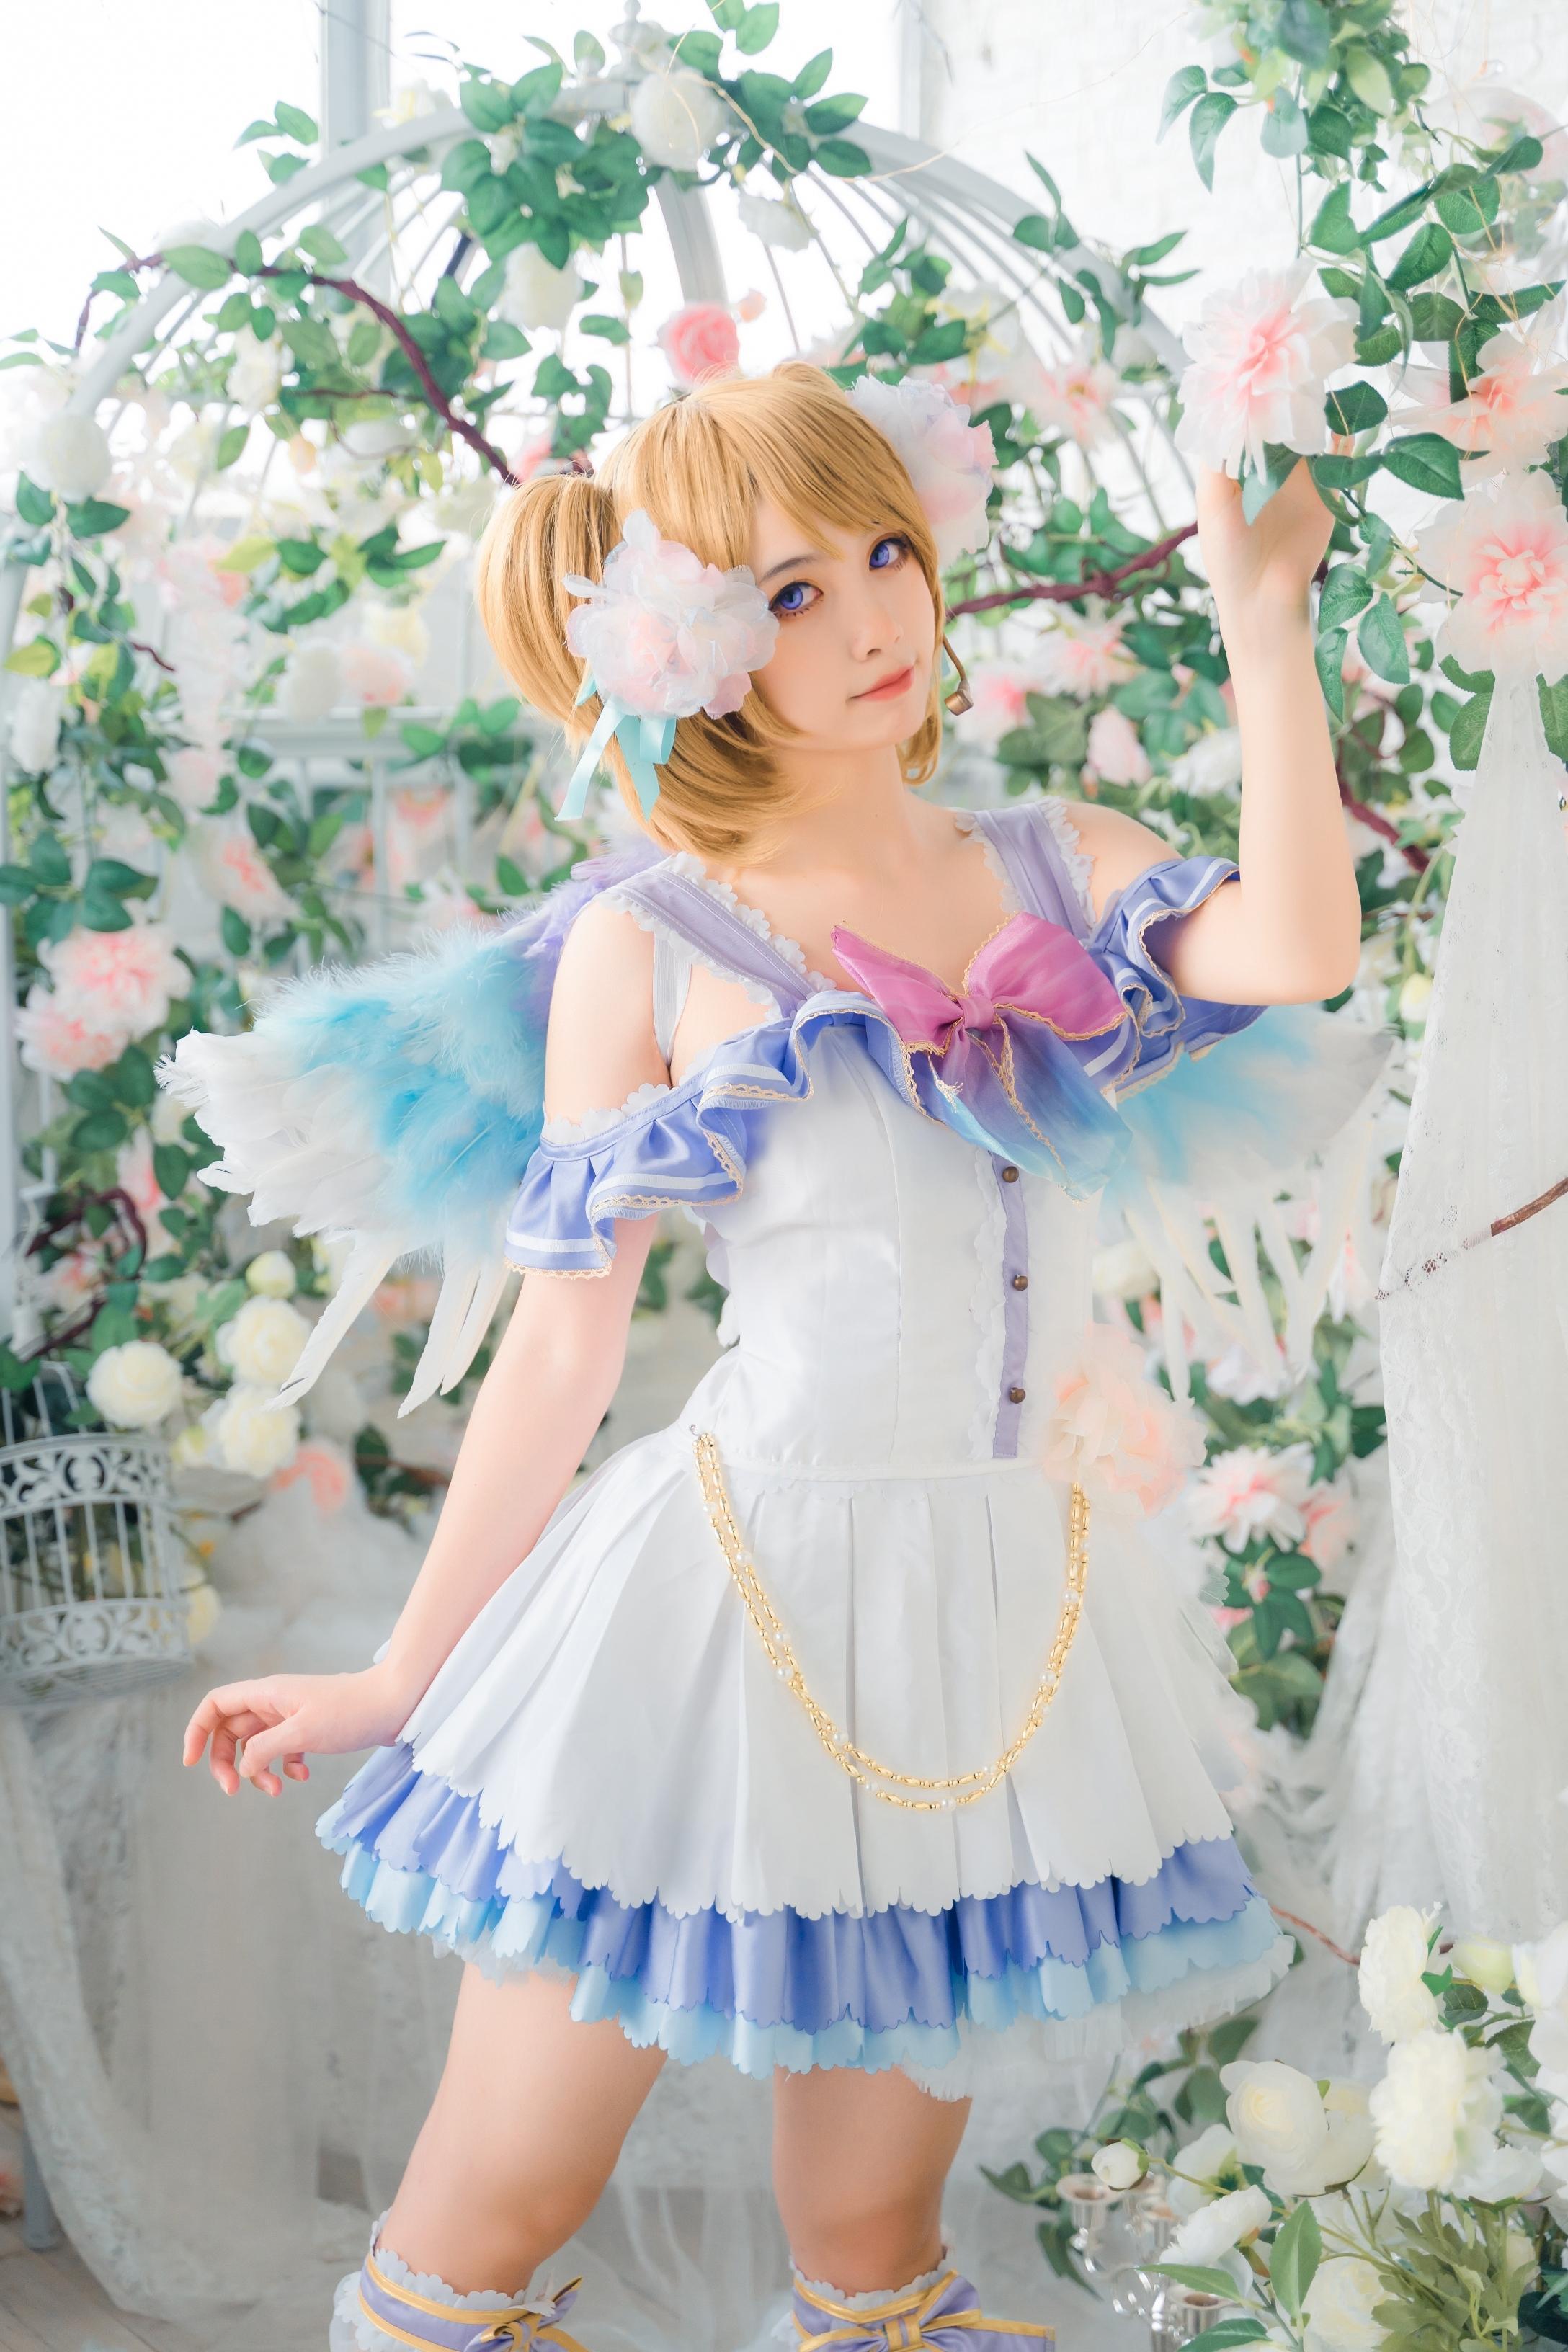 《LOVE LIVE!》小泉花阳cosplay【CN:九曲十八香】-第2张